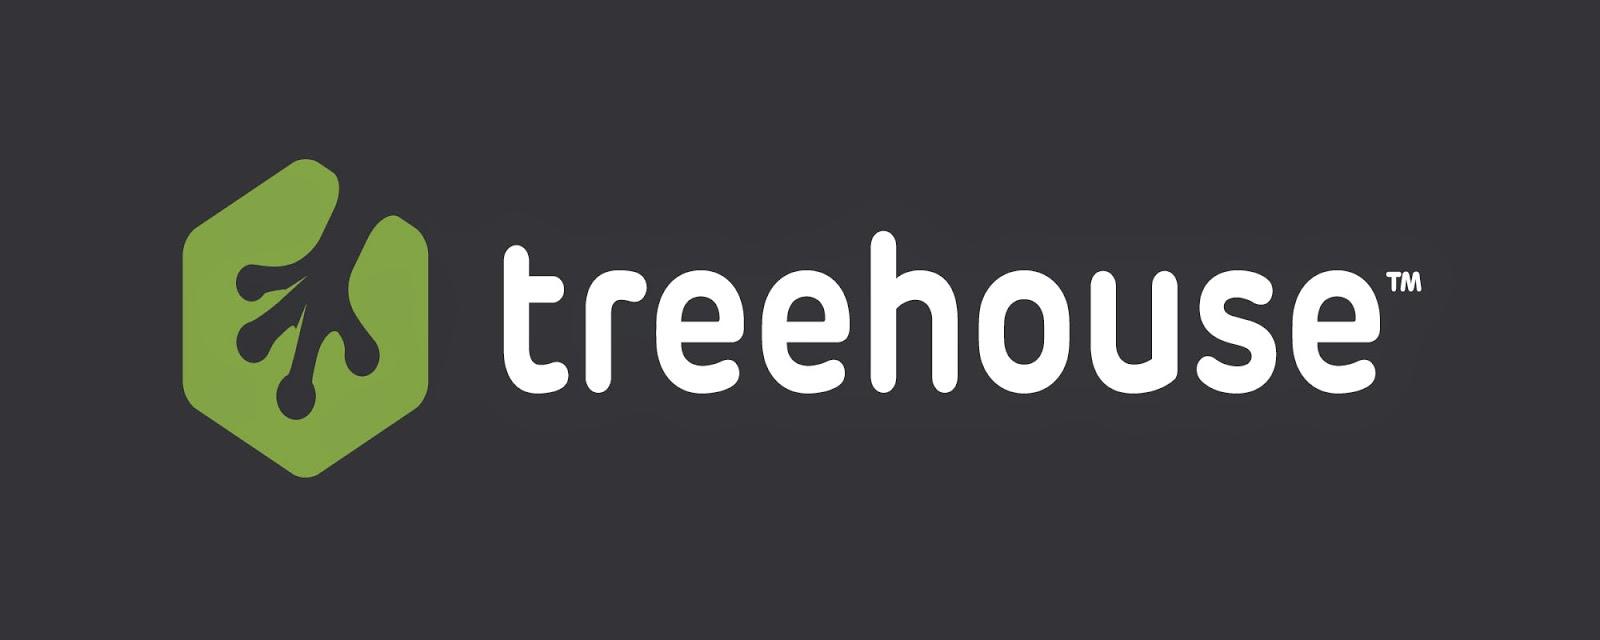 Treehouse - 5 Website yang Nyaman untuk Belajar Bahasa Pemrograman/Koding (HTML, CSS, Java, Ruby, dll)